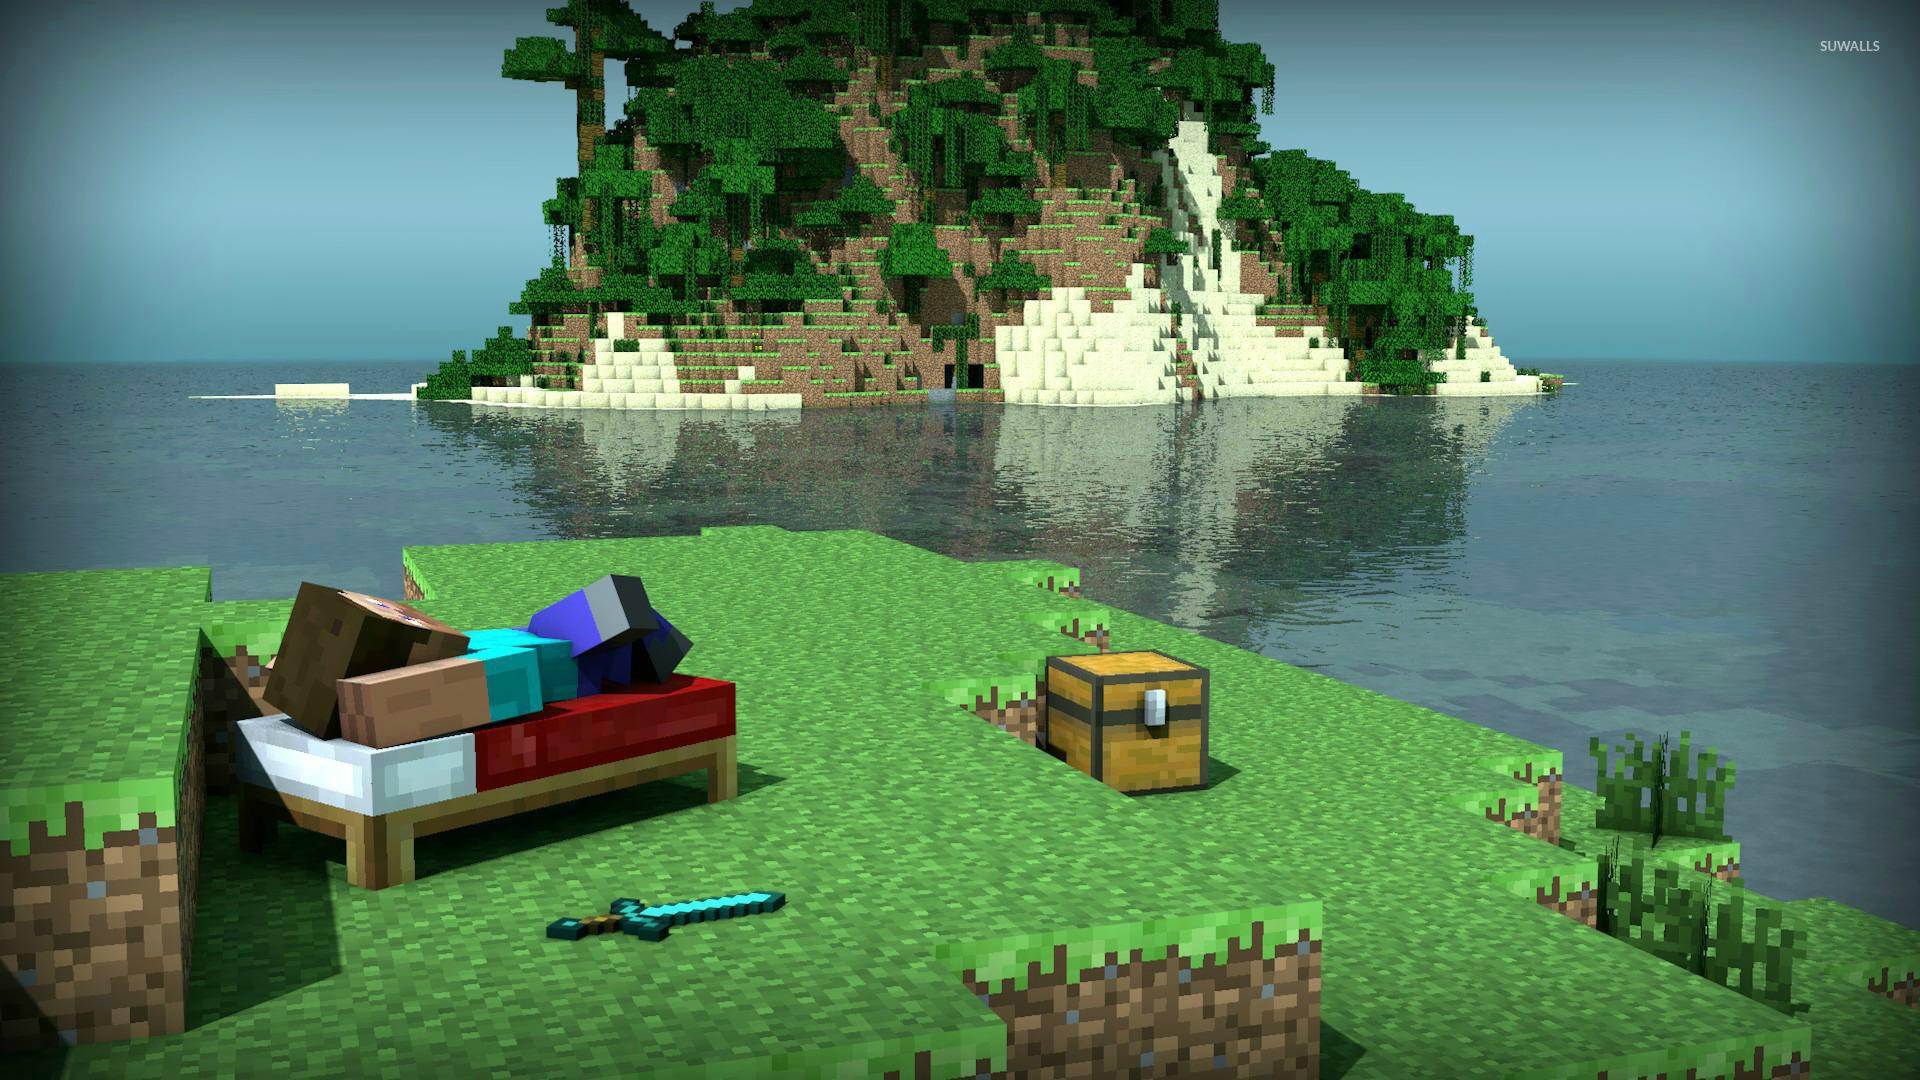 minecraft island wallpaper 1080p - photo #16